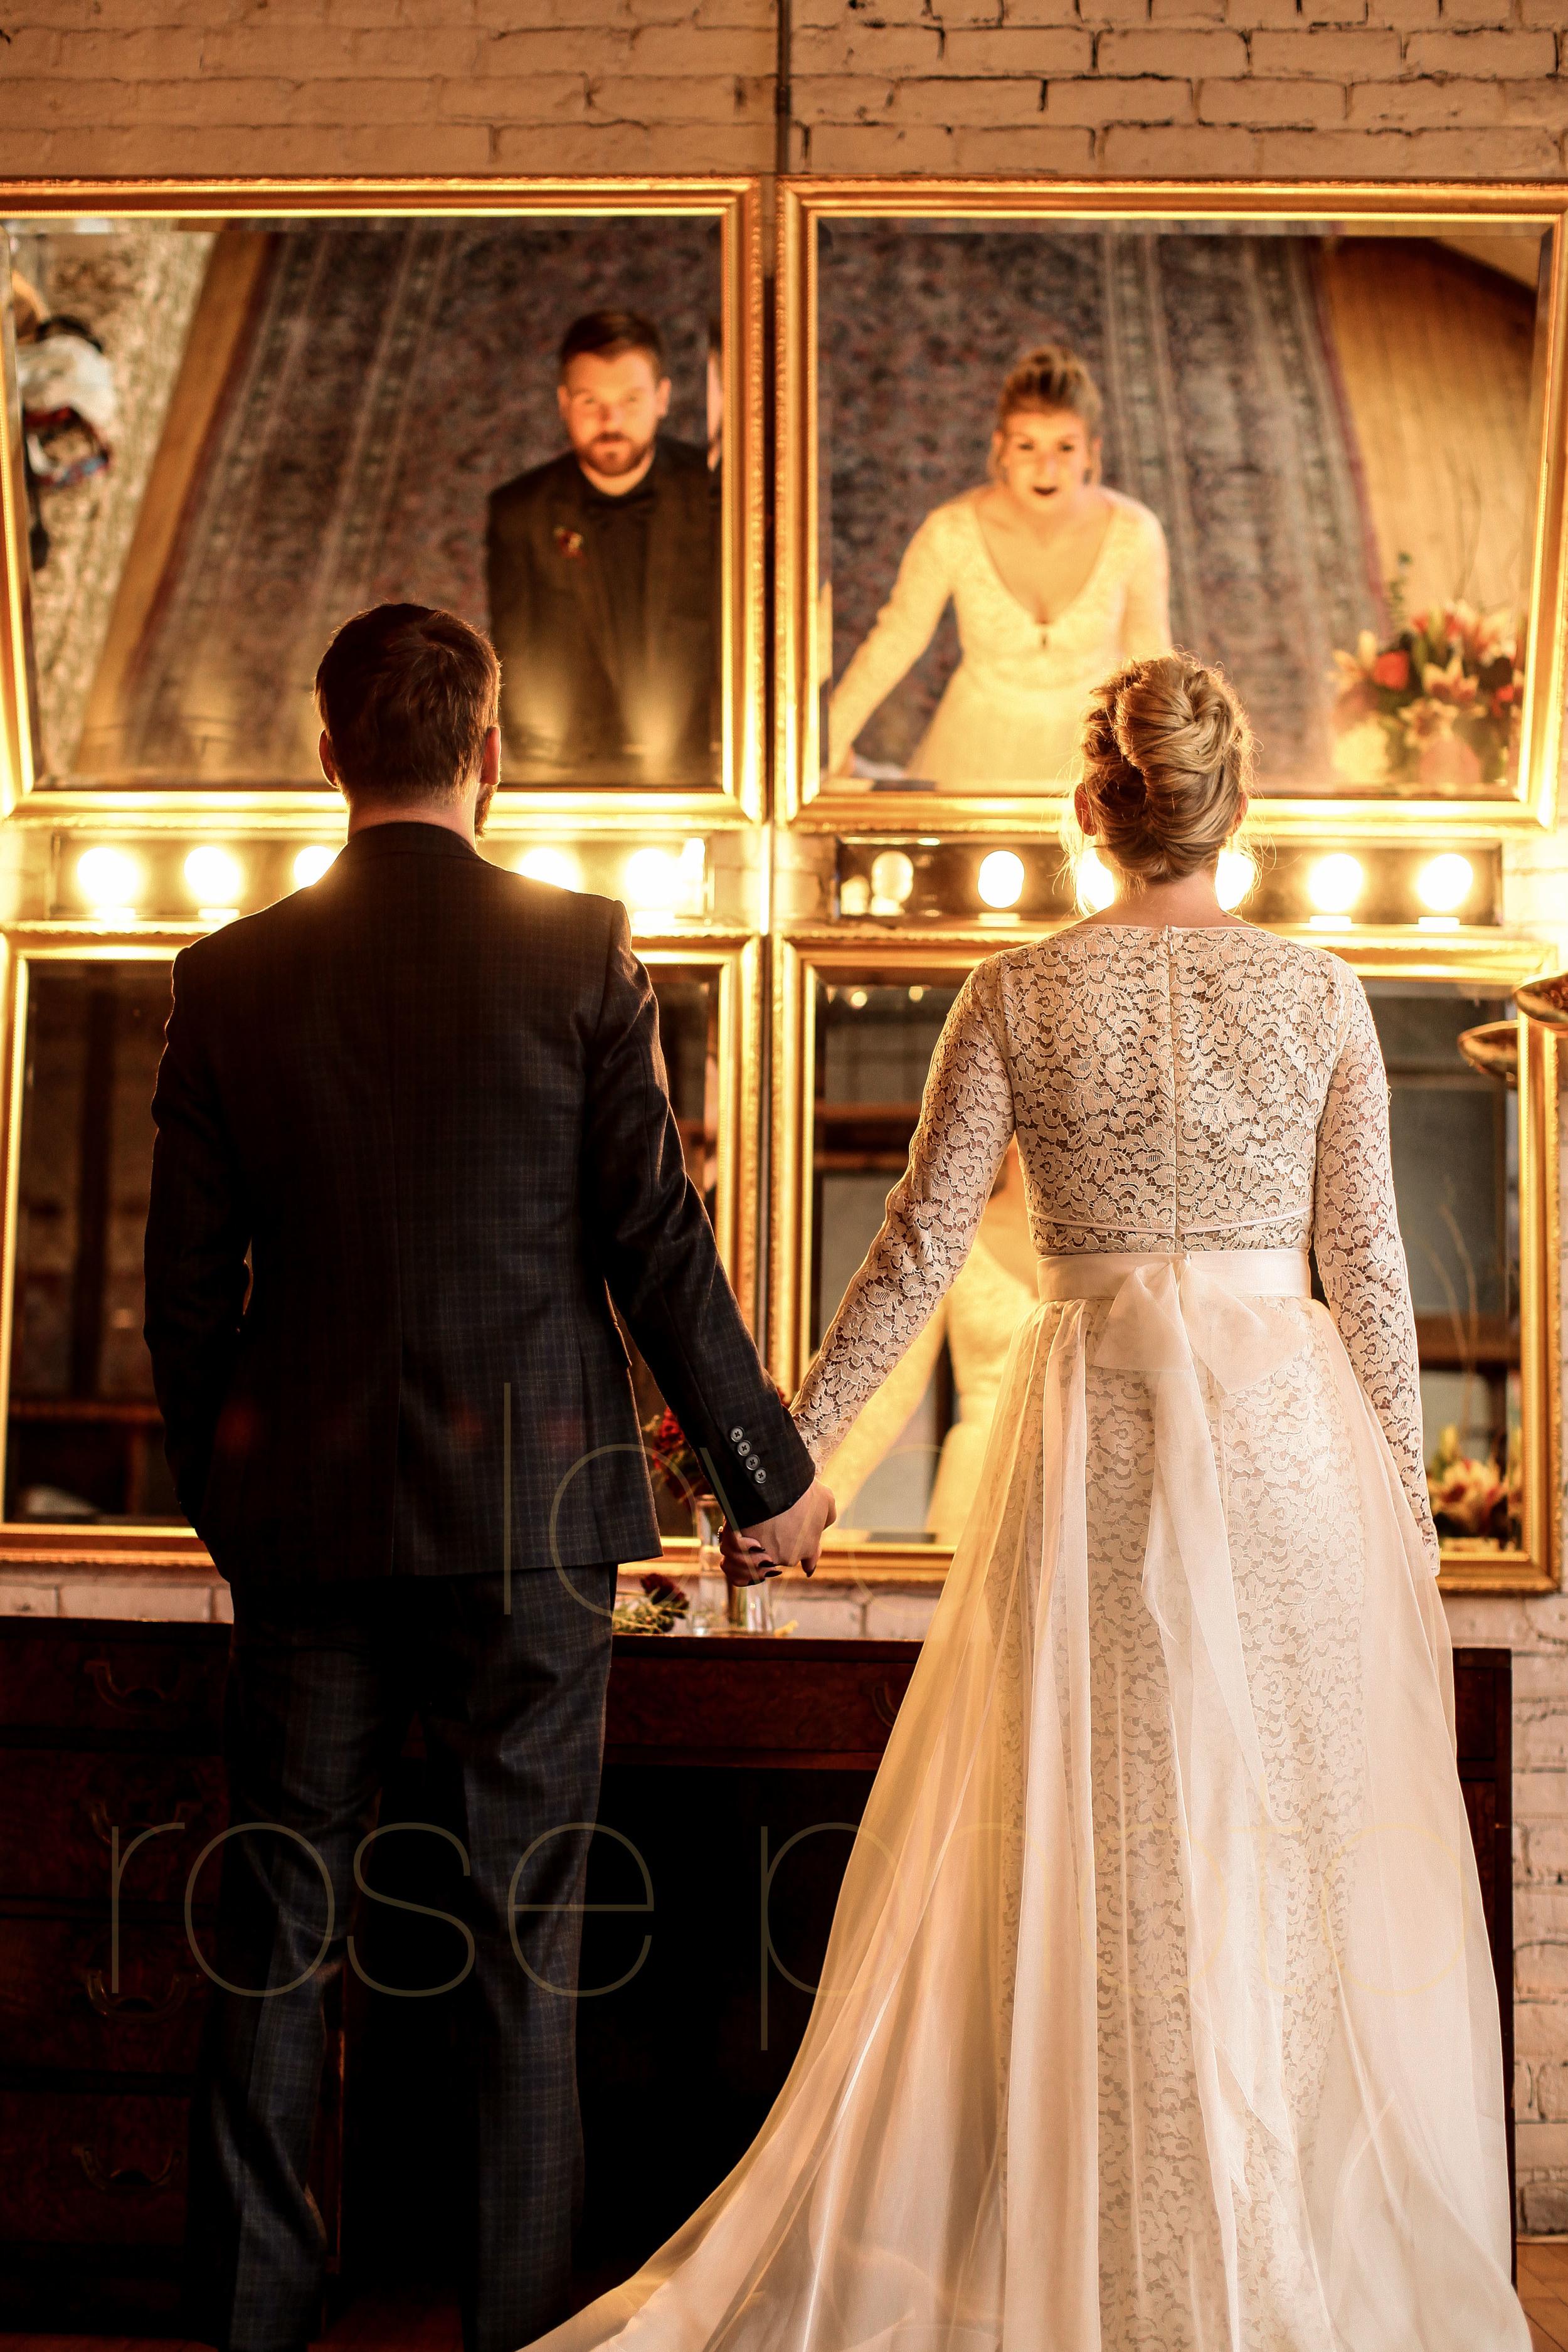 West Fulton Chicago Wedding Venue Salvage One photography enagement photos bride groom first dance-14.jpg